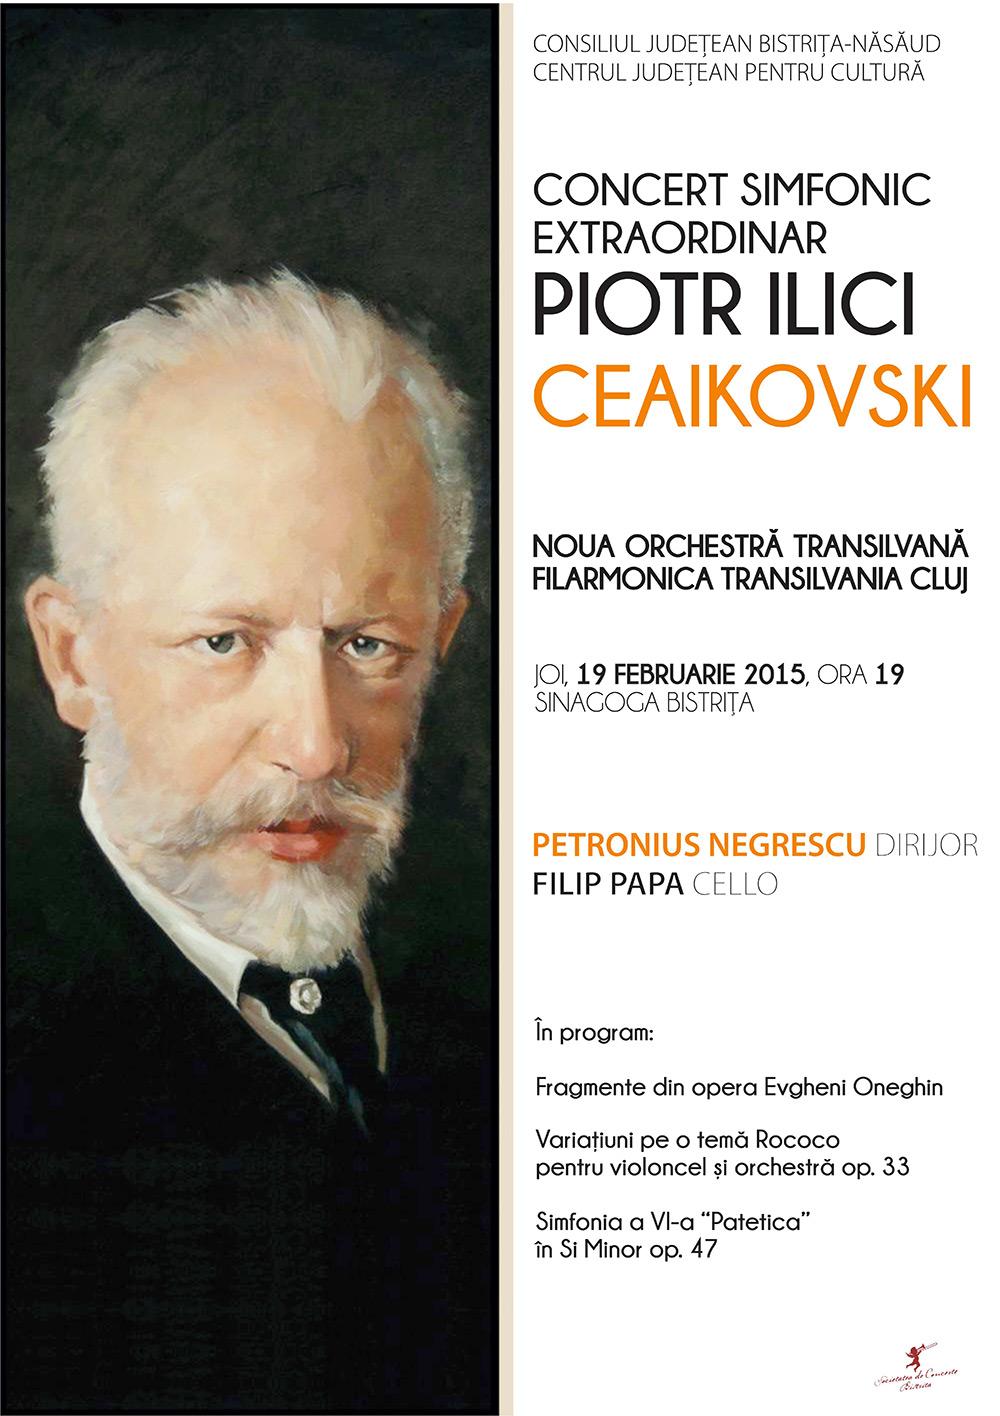 afis-concert-simfonic-ceaikovski-2015